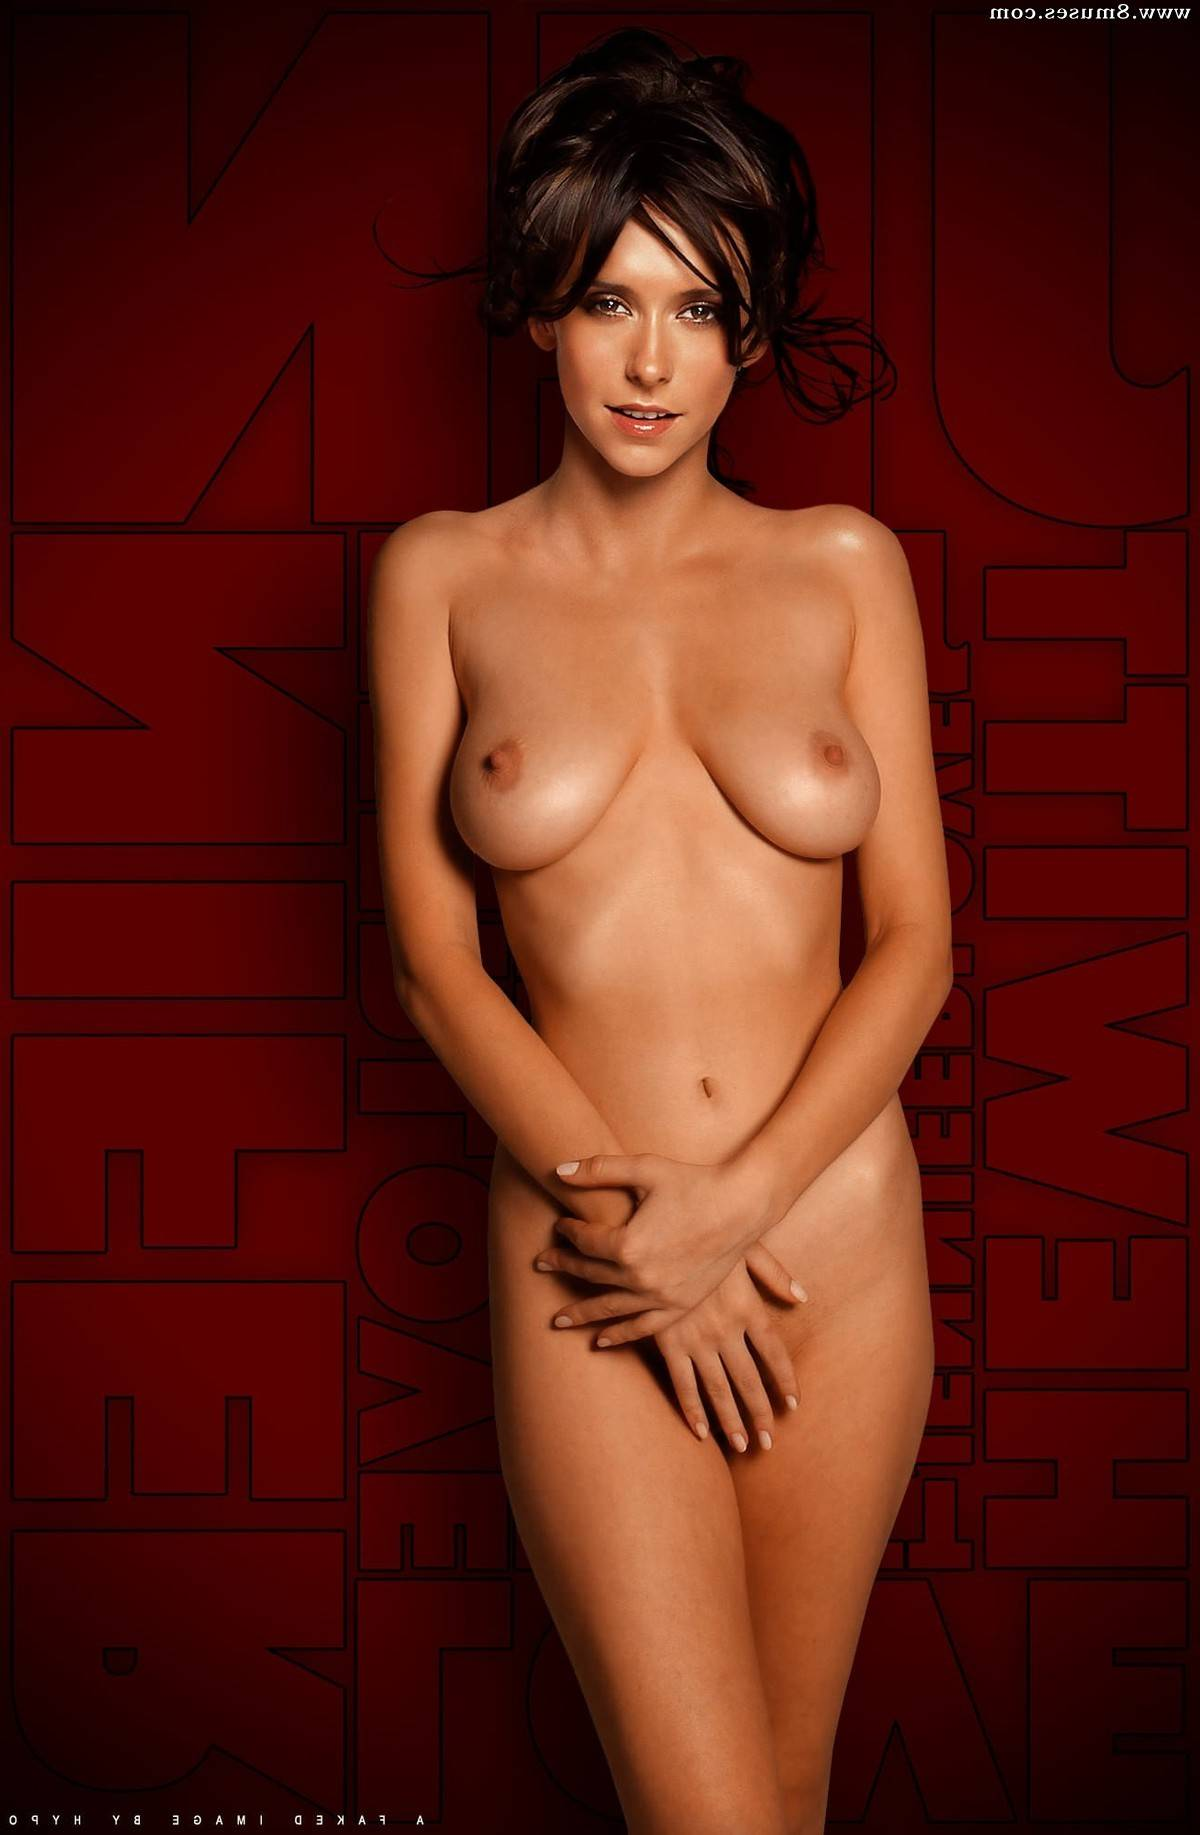 Jennifer love hewitt nude photos sex scene pics